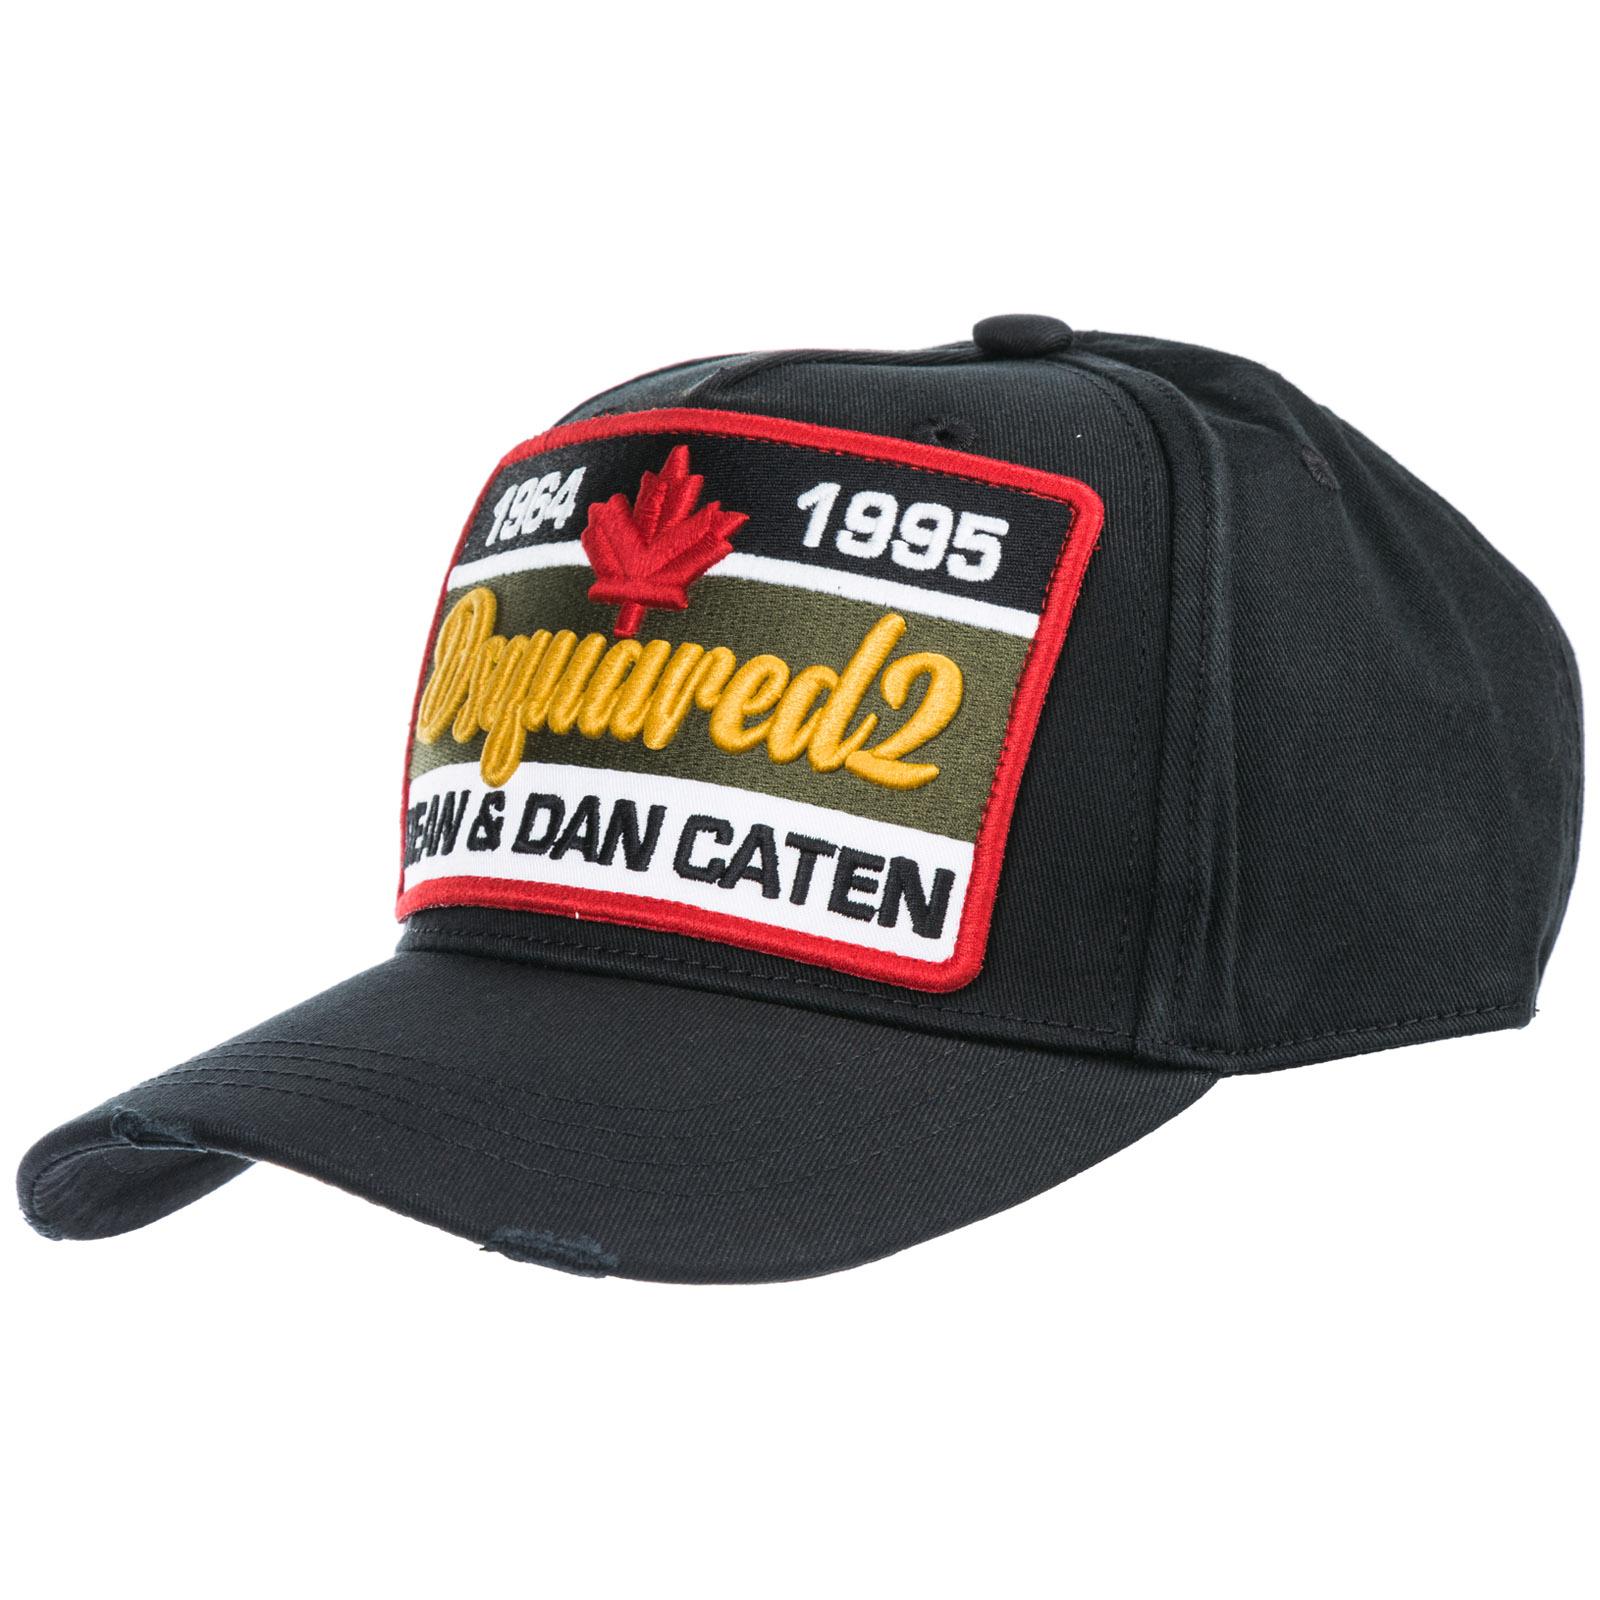 Dsquared2 Adjustable Men S Cotton Hat Baseball Cap In Black  b1b5f5d3e4ce